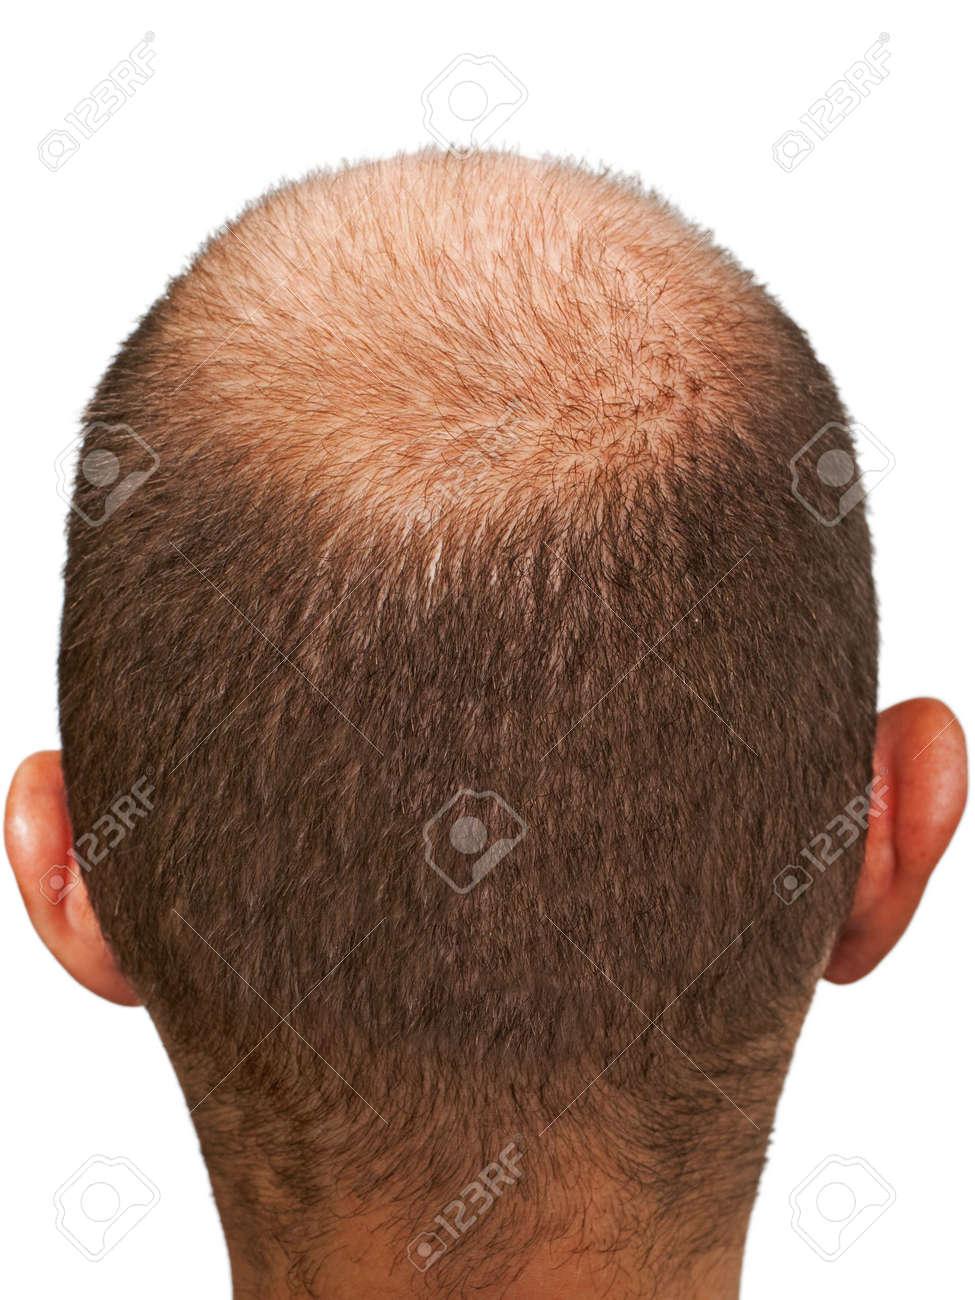 Шаблоны для стрижки волос на голове